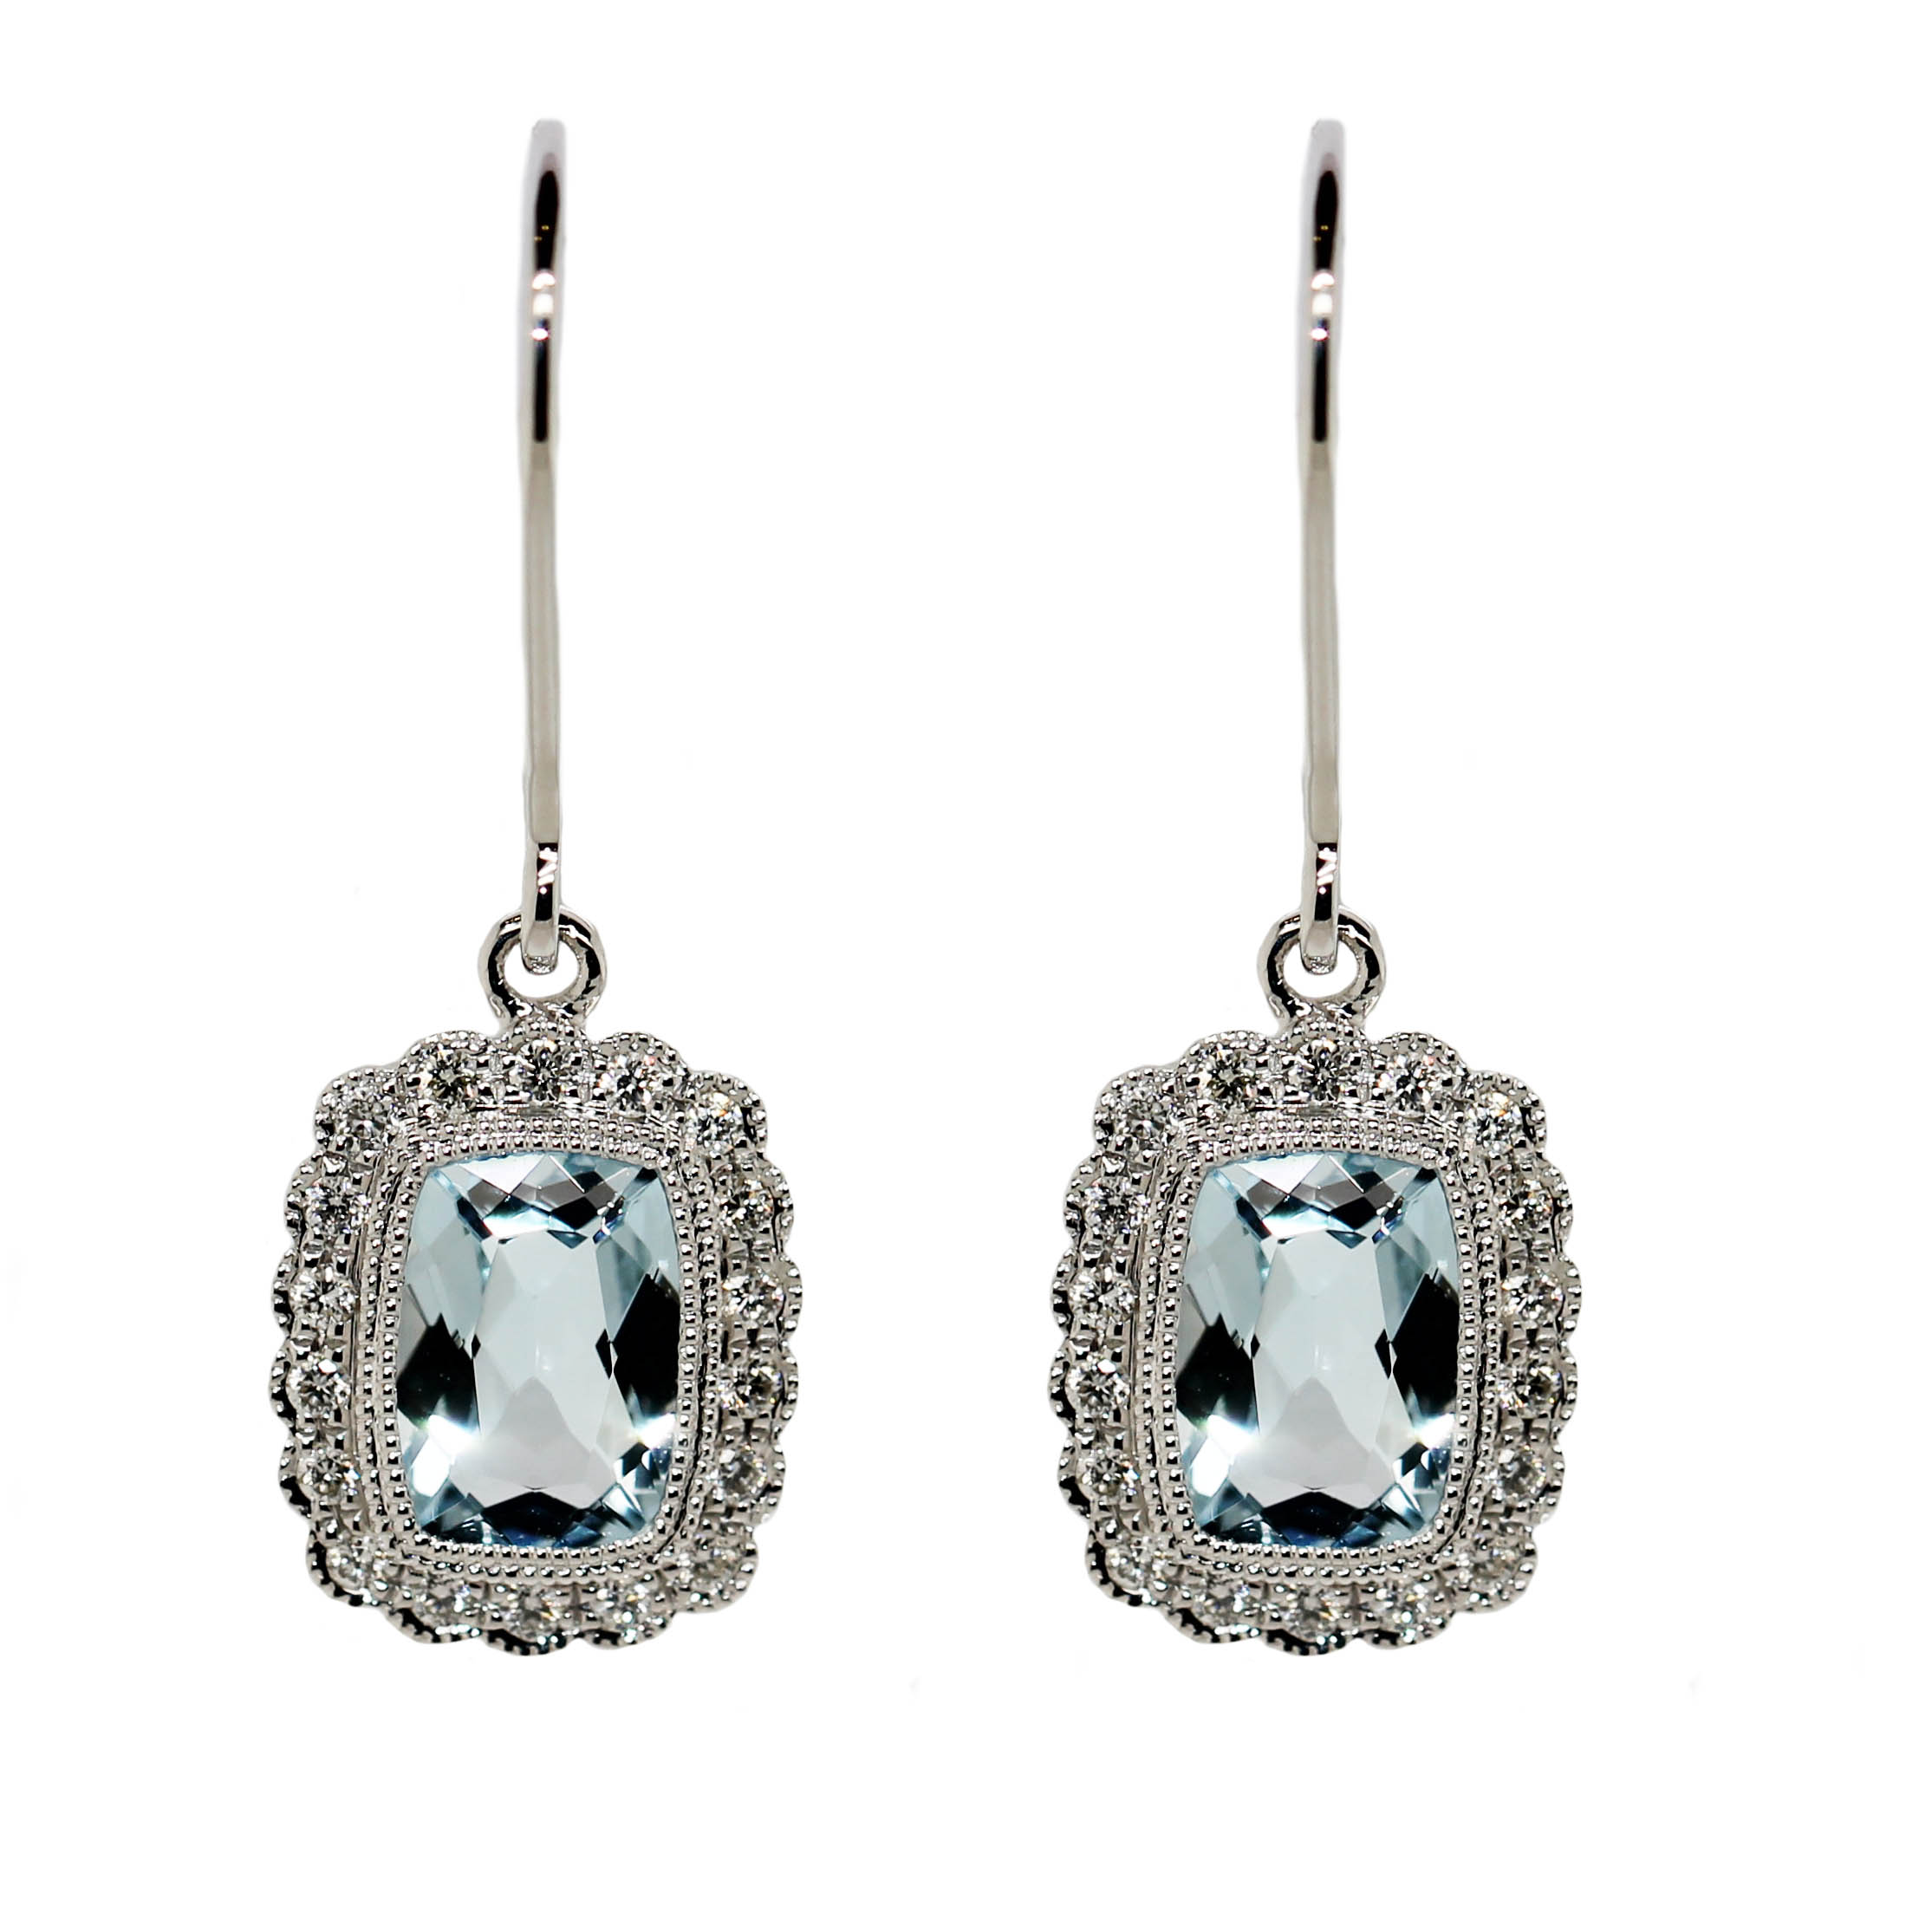 9ct White Gold, 2 Aquamarines equaling 1.55ct & .19ct of Diamonds.